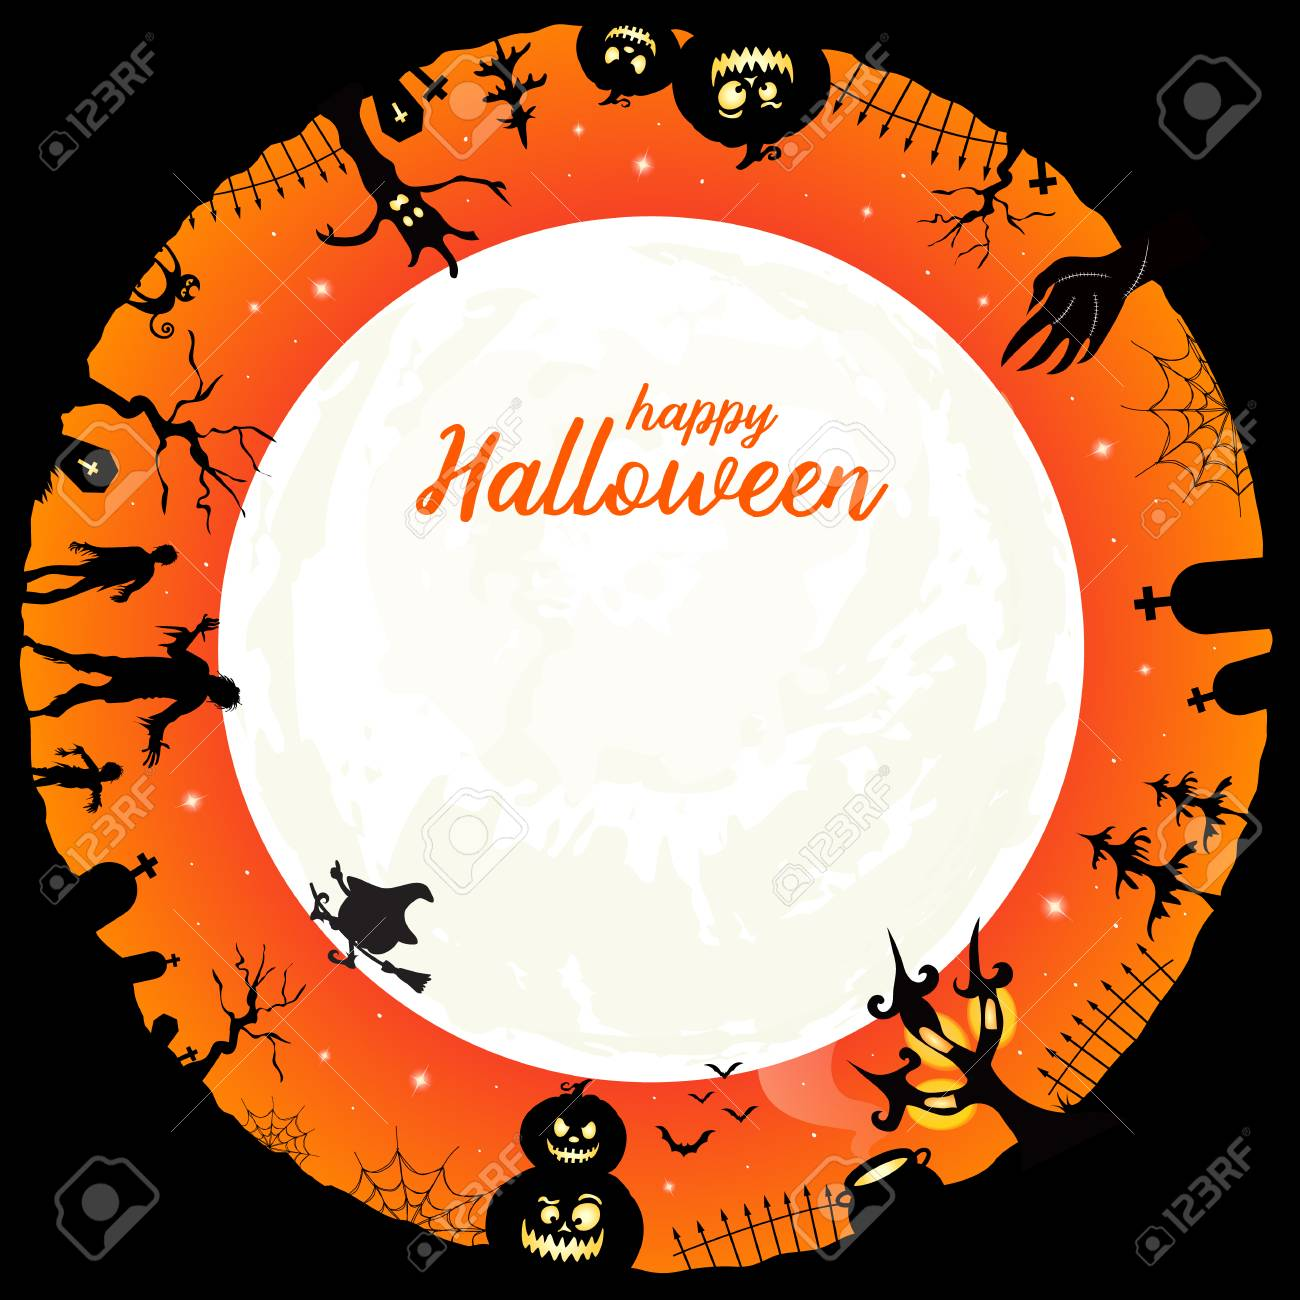 happy halloween message halloween element in circle design